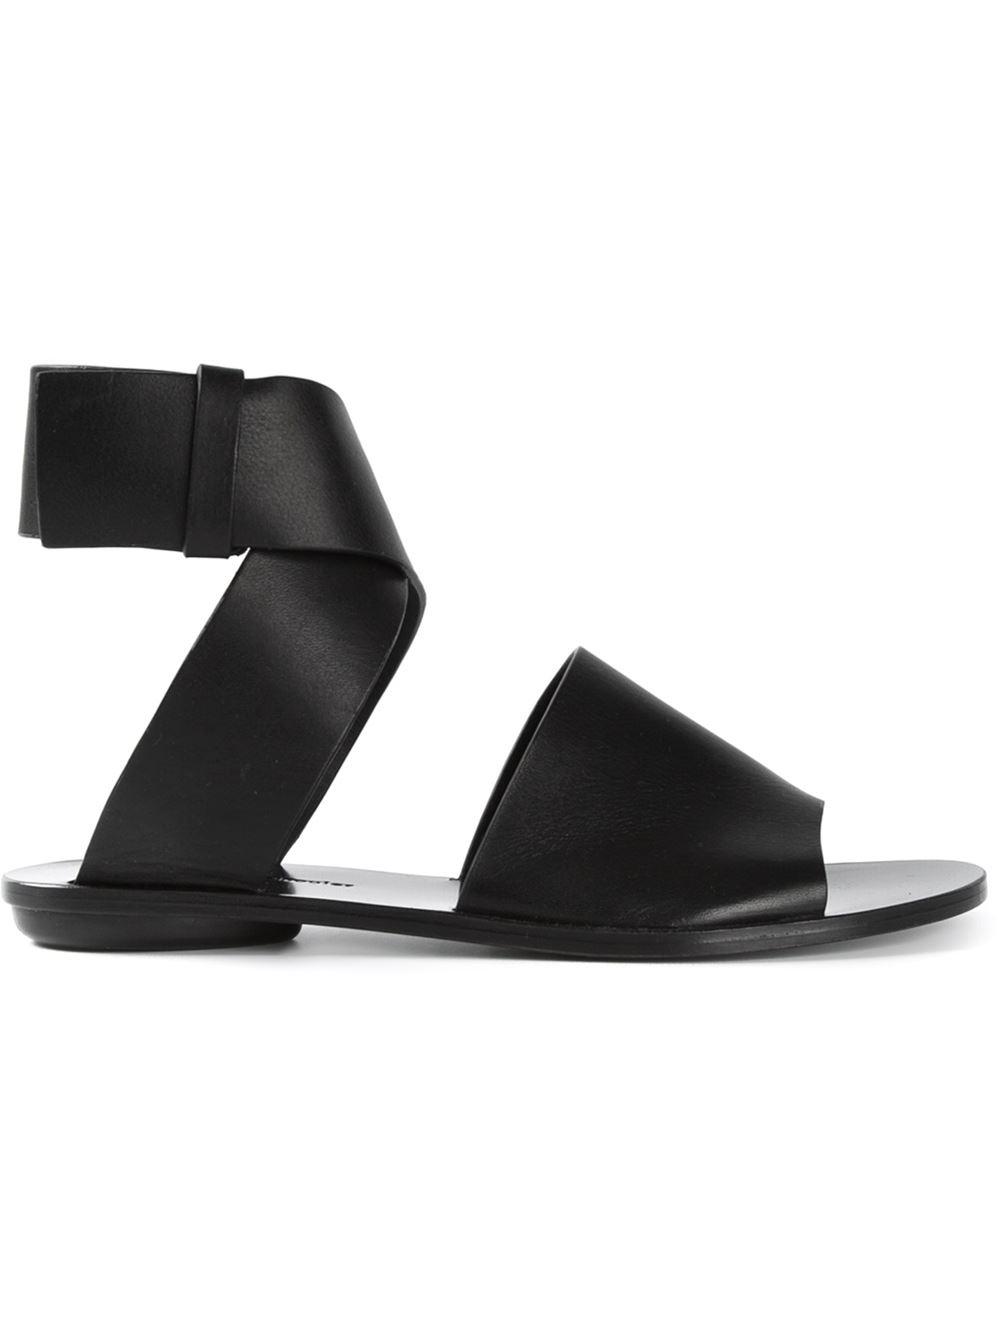 Proenza Schouler Coiled Strap Sandals In Black Lyst